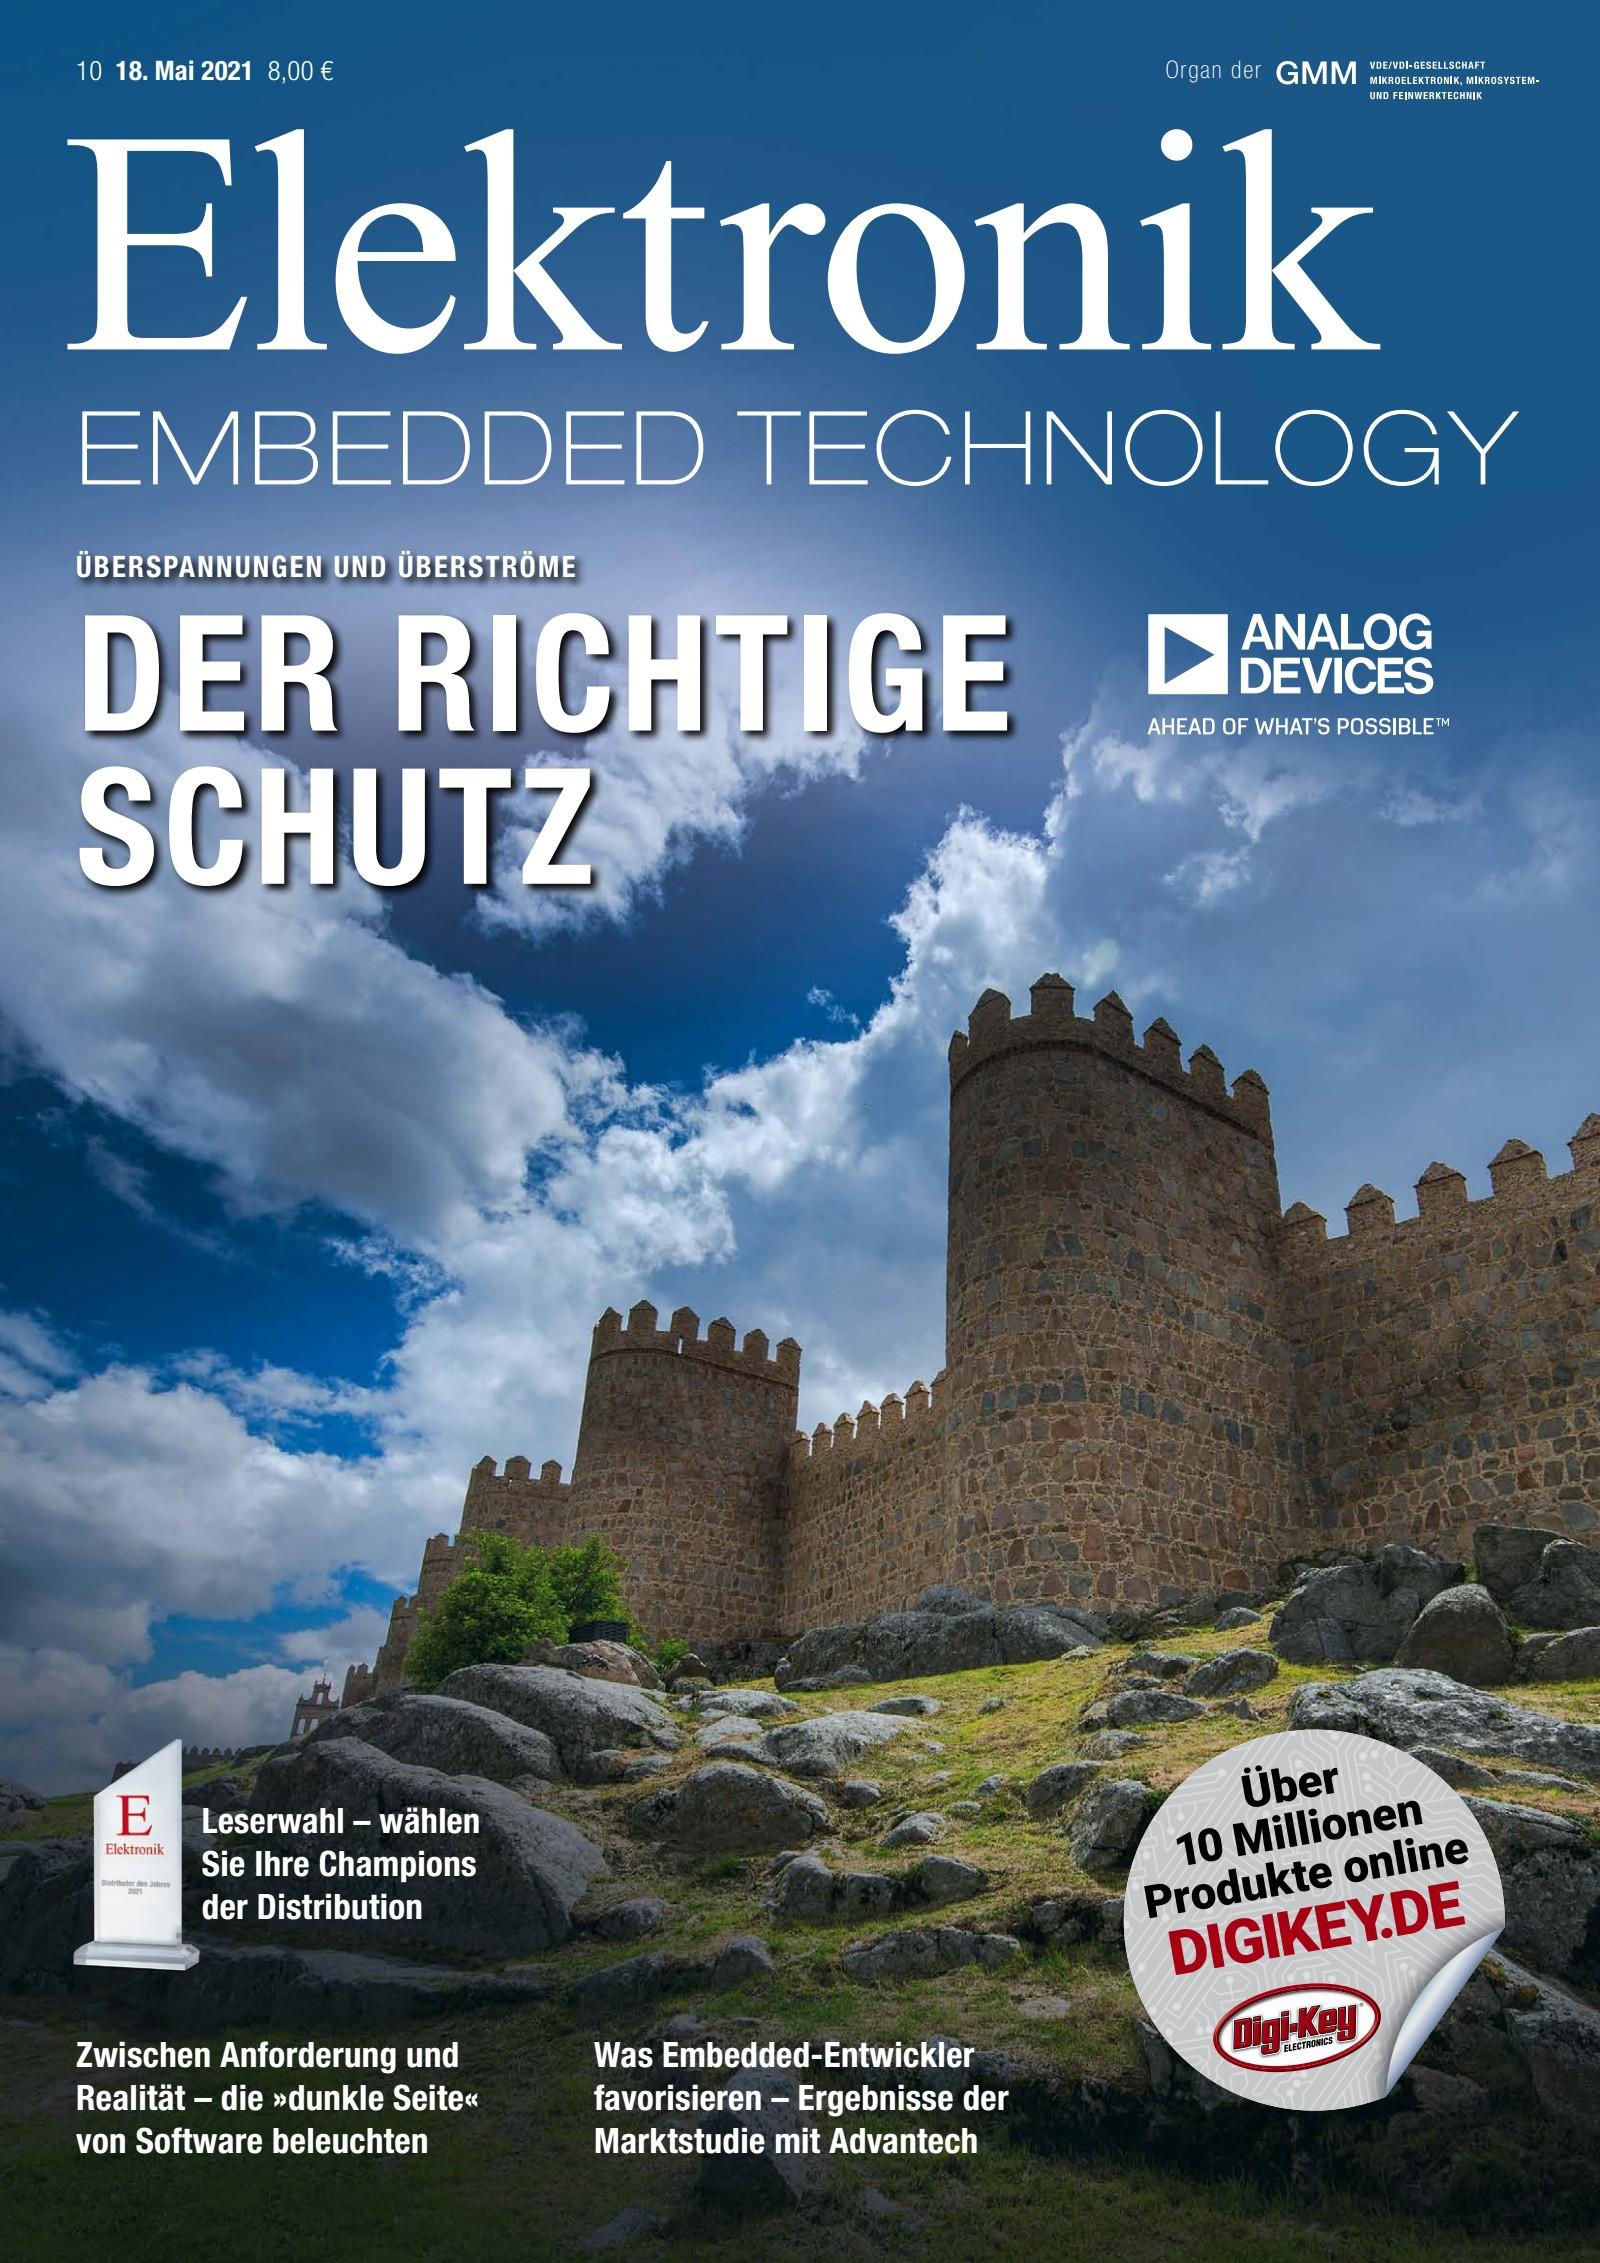 Elektronik 10/2021 Digital